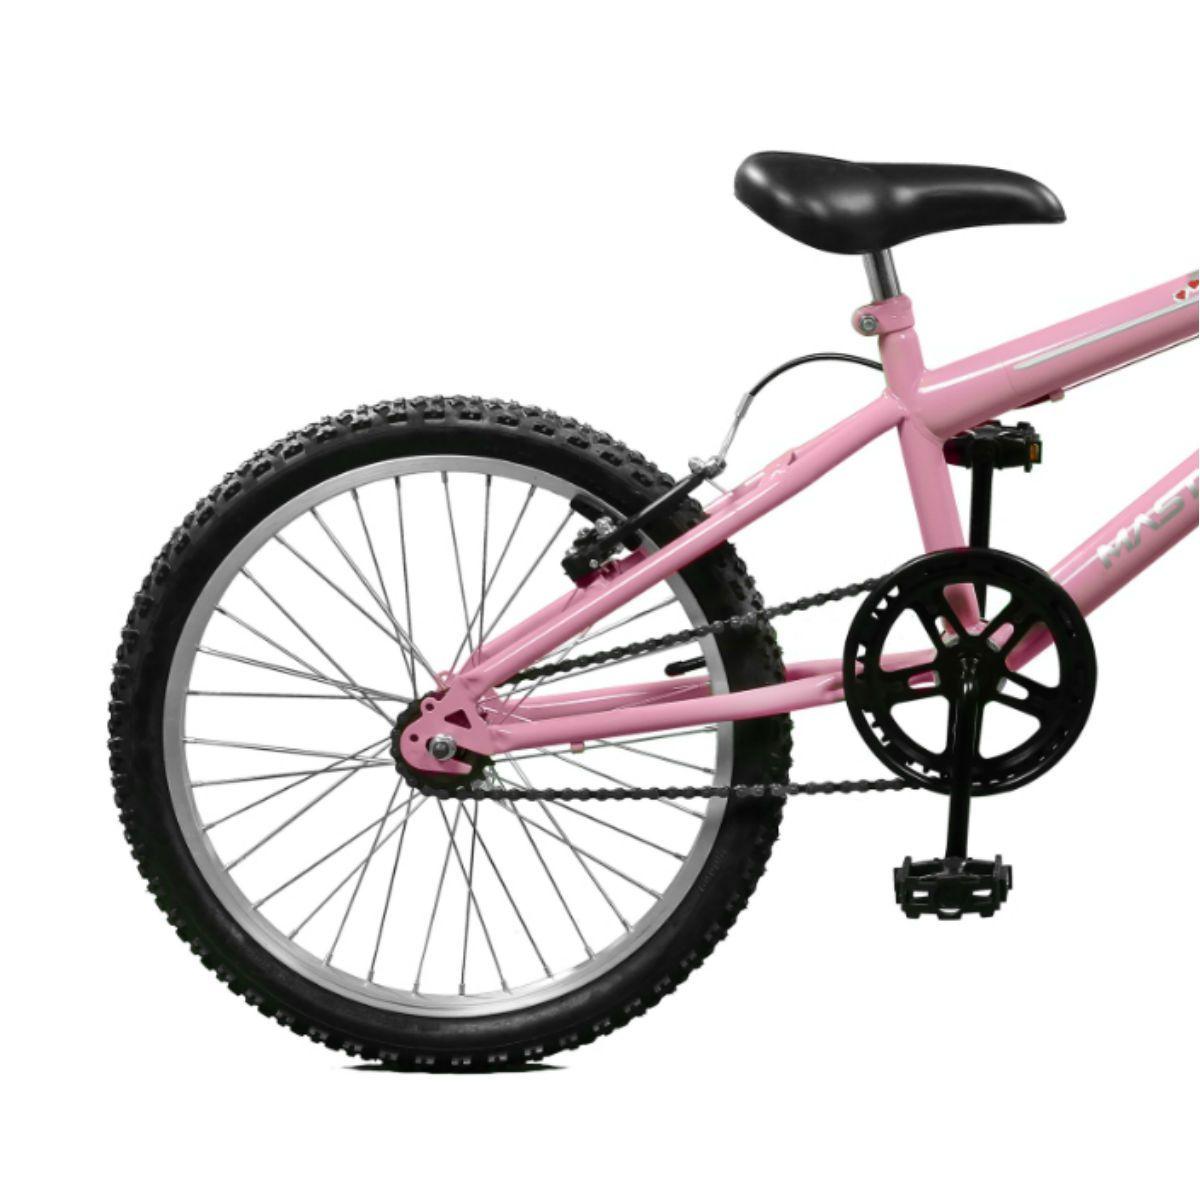 Bicicleta Master Bike Aro 20 Serena Freio V-Brake Rosa/Branco